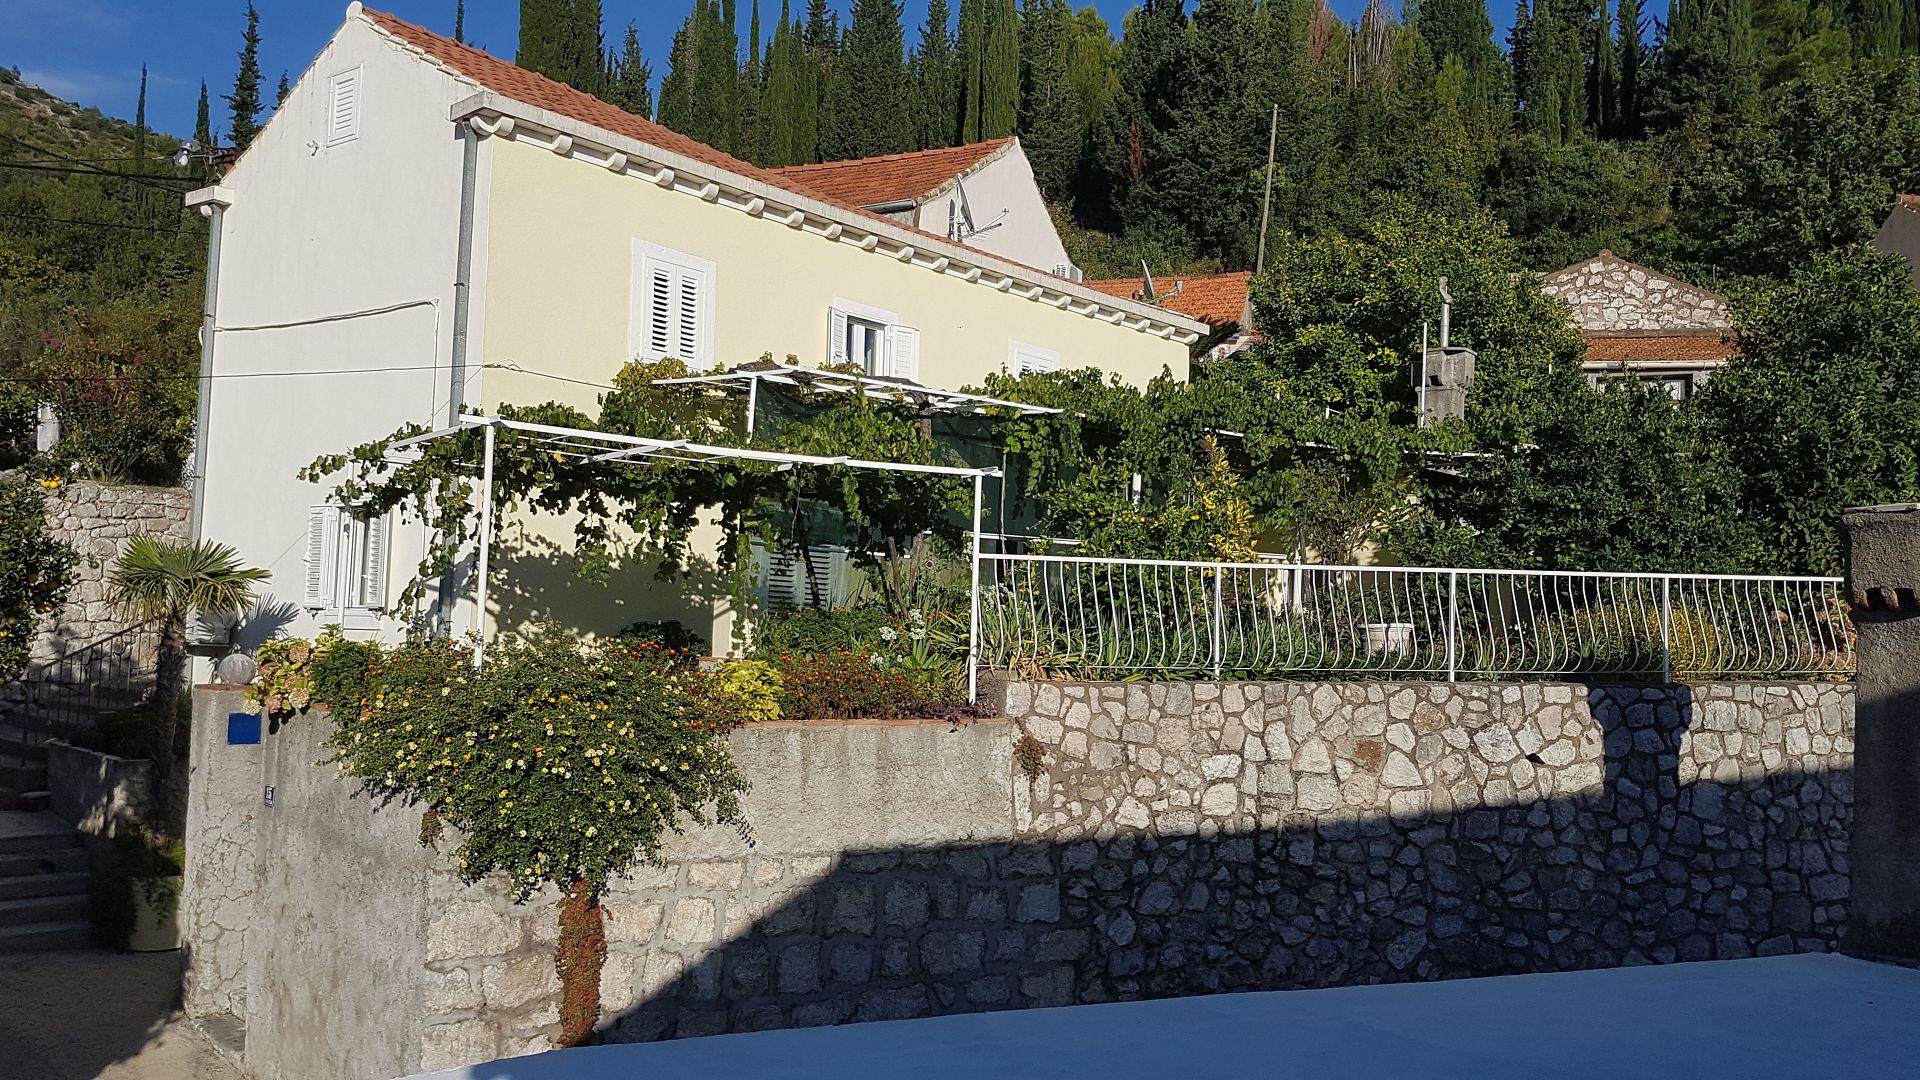 Villa Marija - Trsteno - Holiday houses, villas Croatia